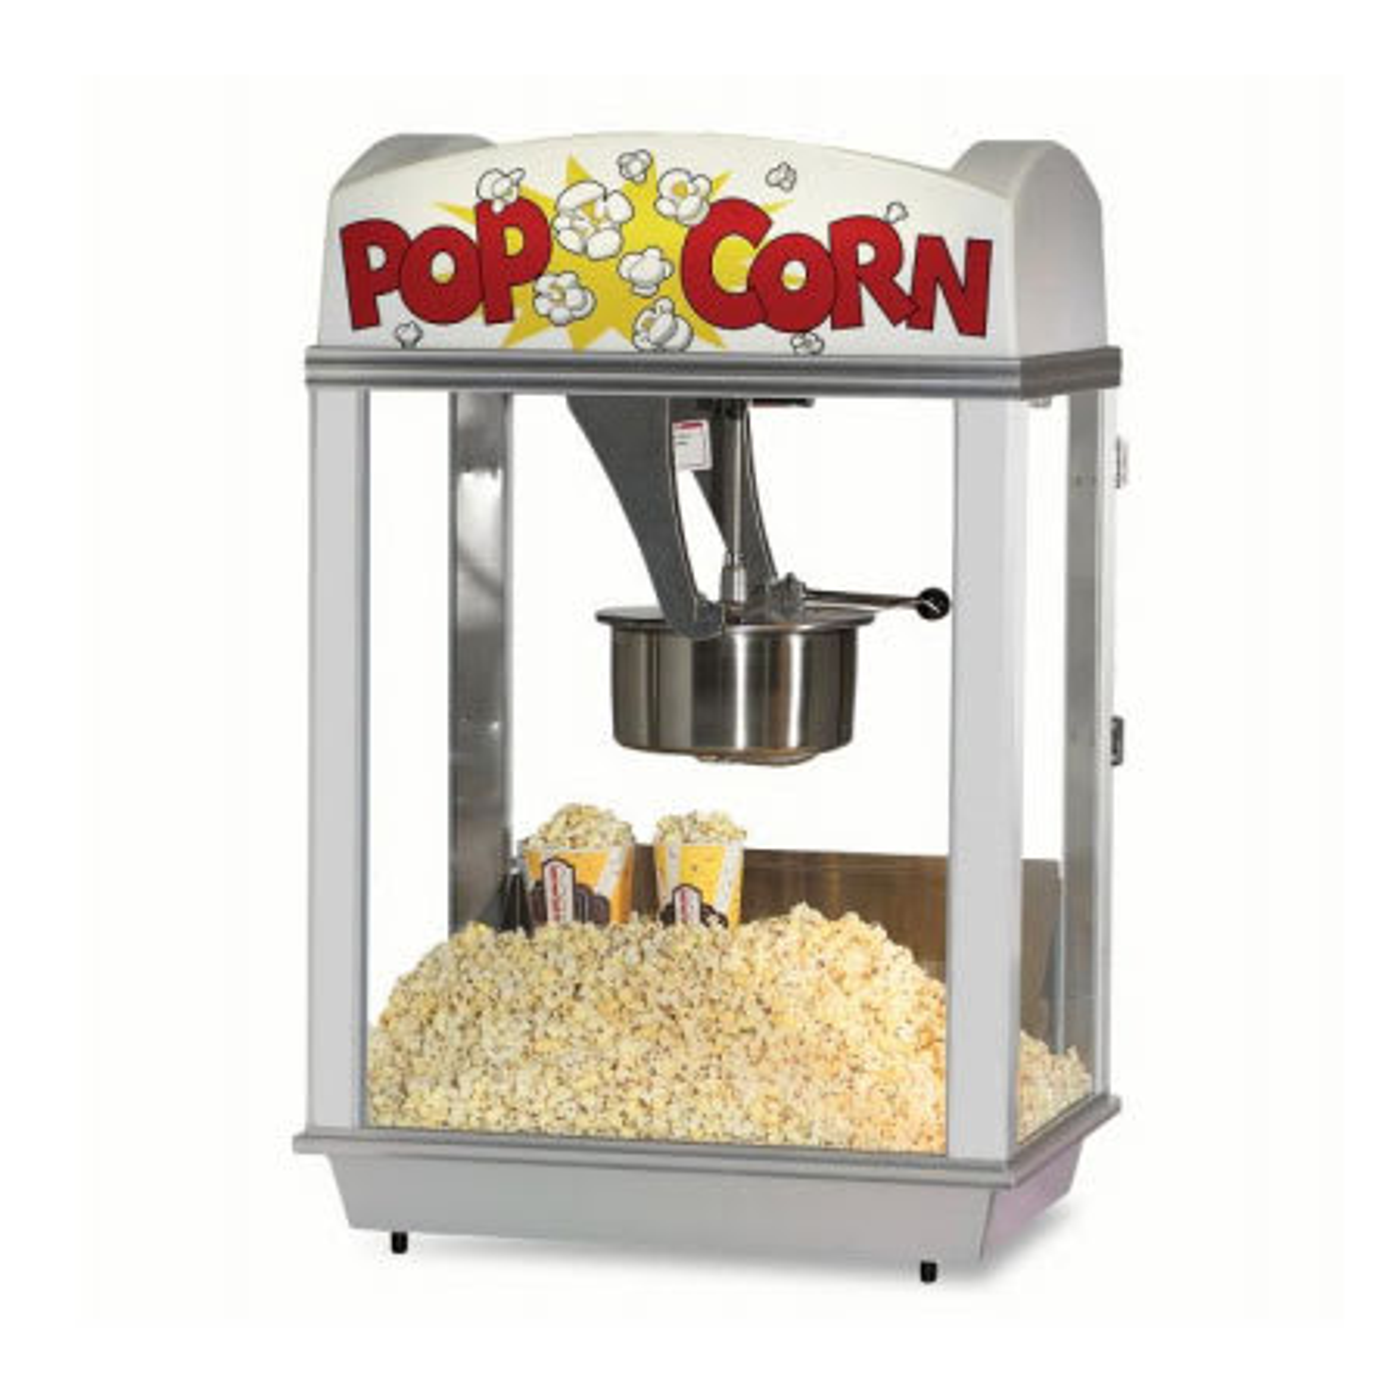 Gold Medal 2001 120208 Citation Popcorn Machine w/ 16-oz Unimaxx Kettle & White Dome, 120v